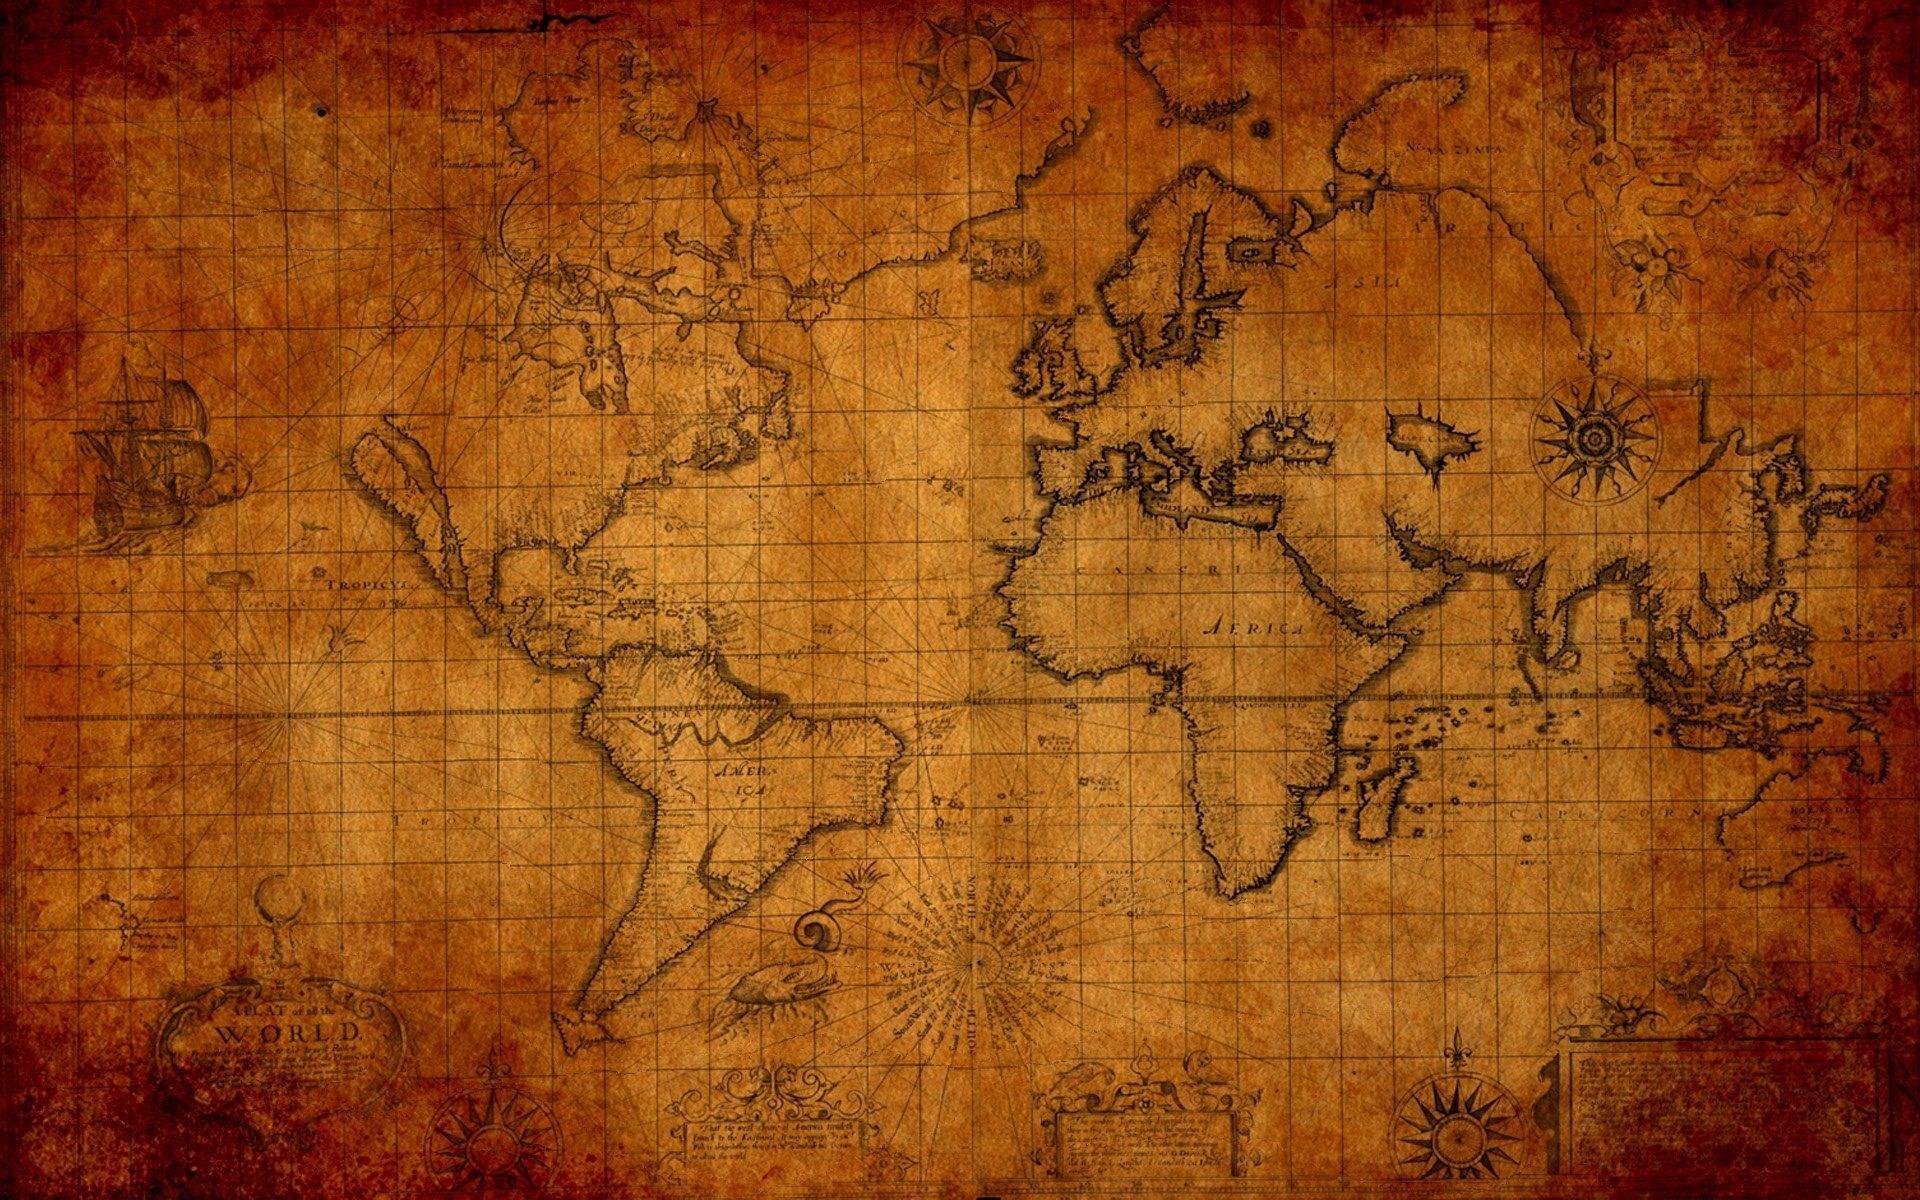 World Map Screensaver Wallpaper 56 images